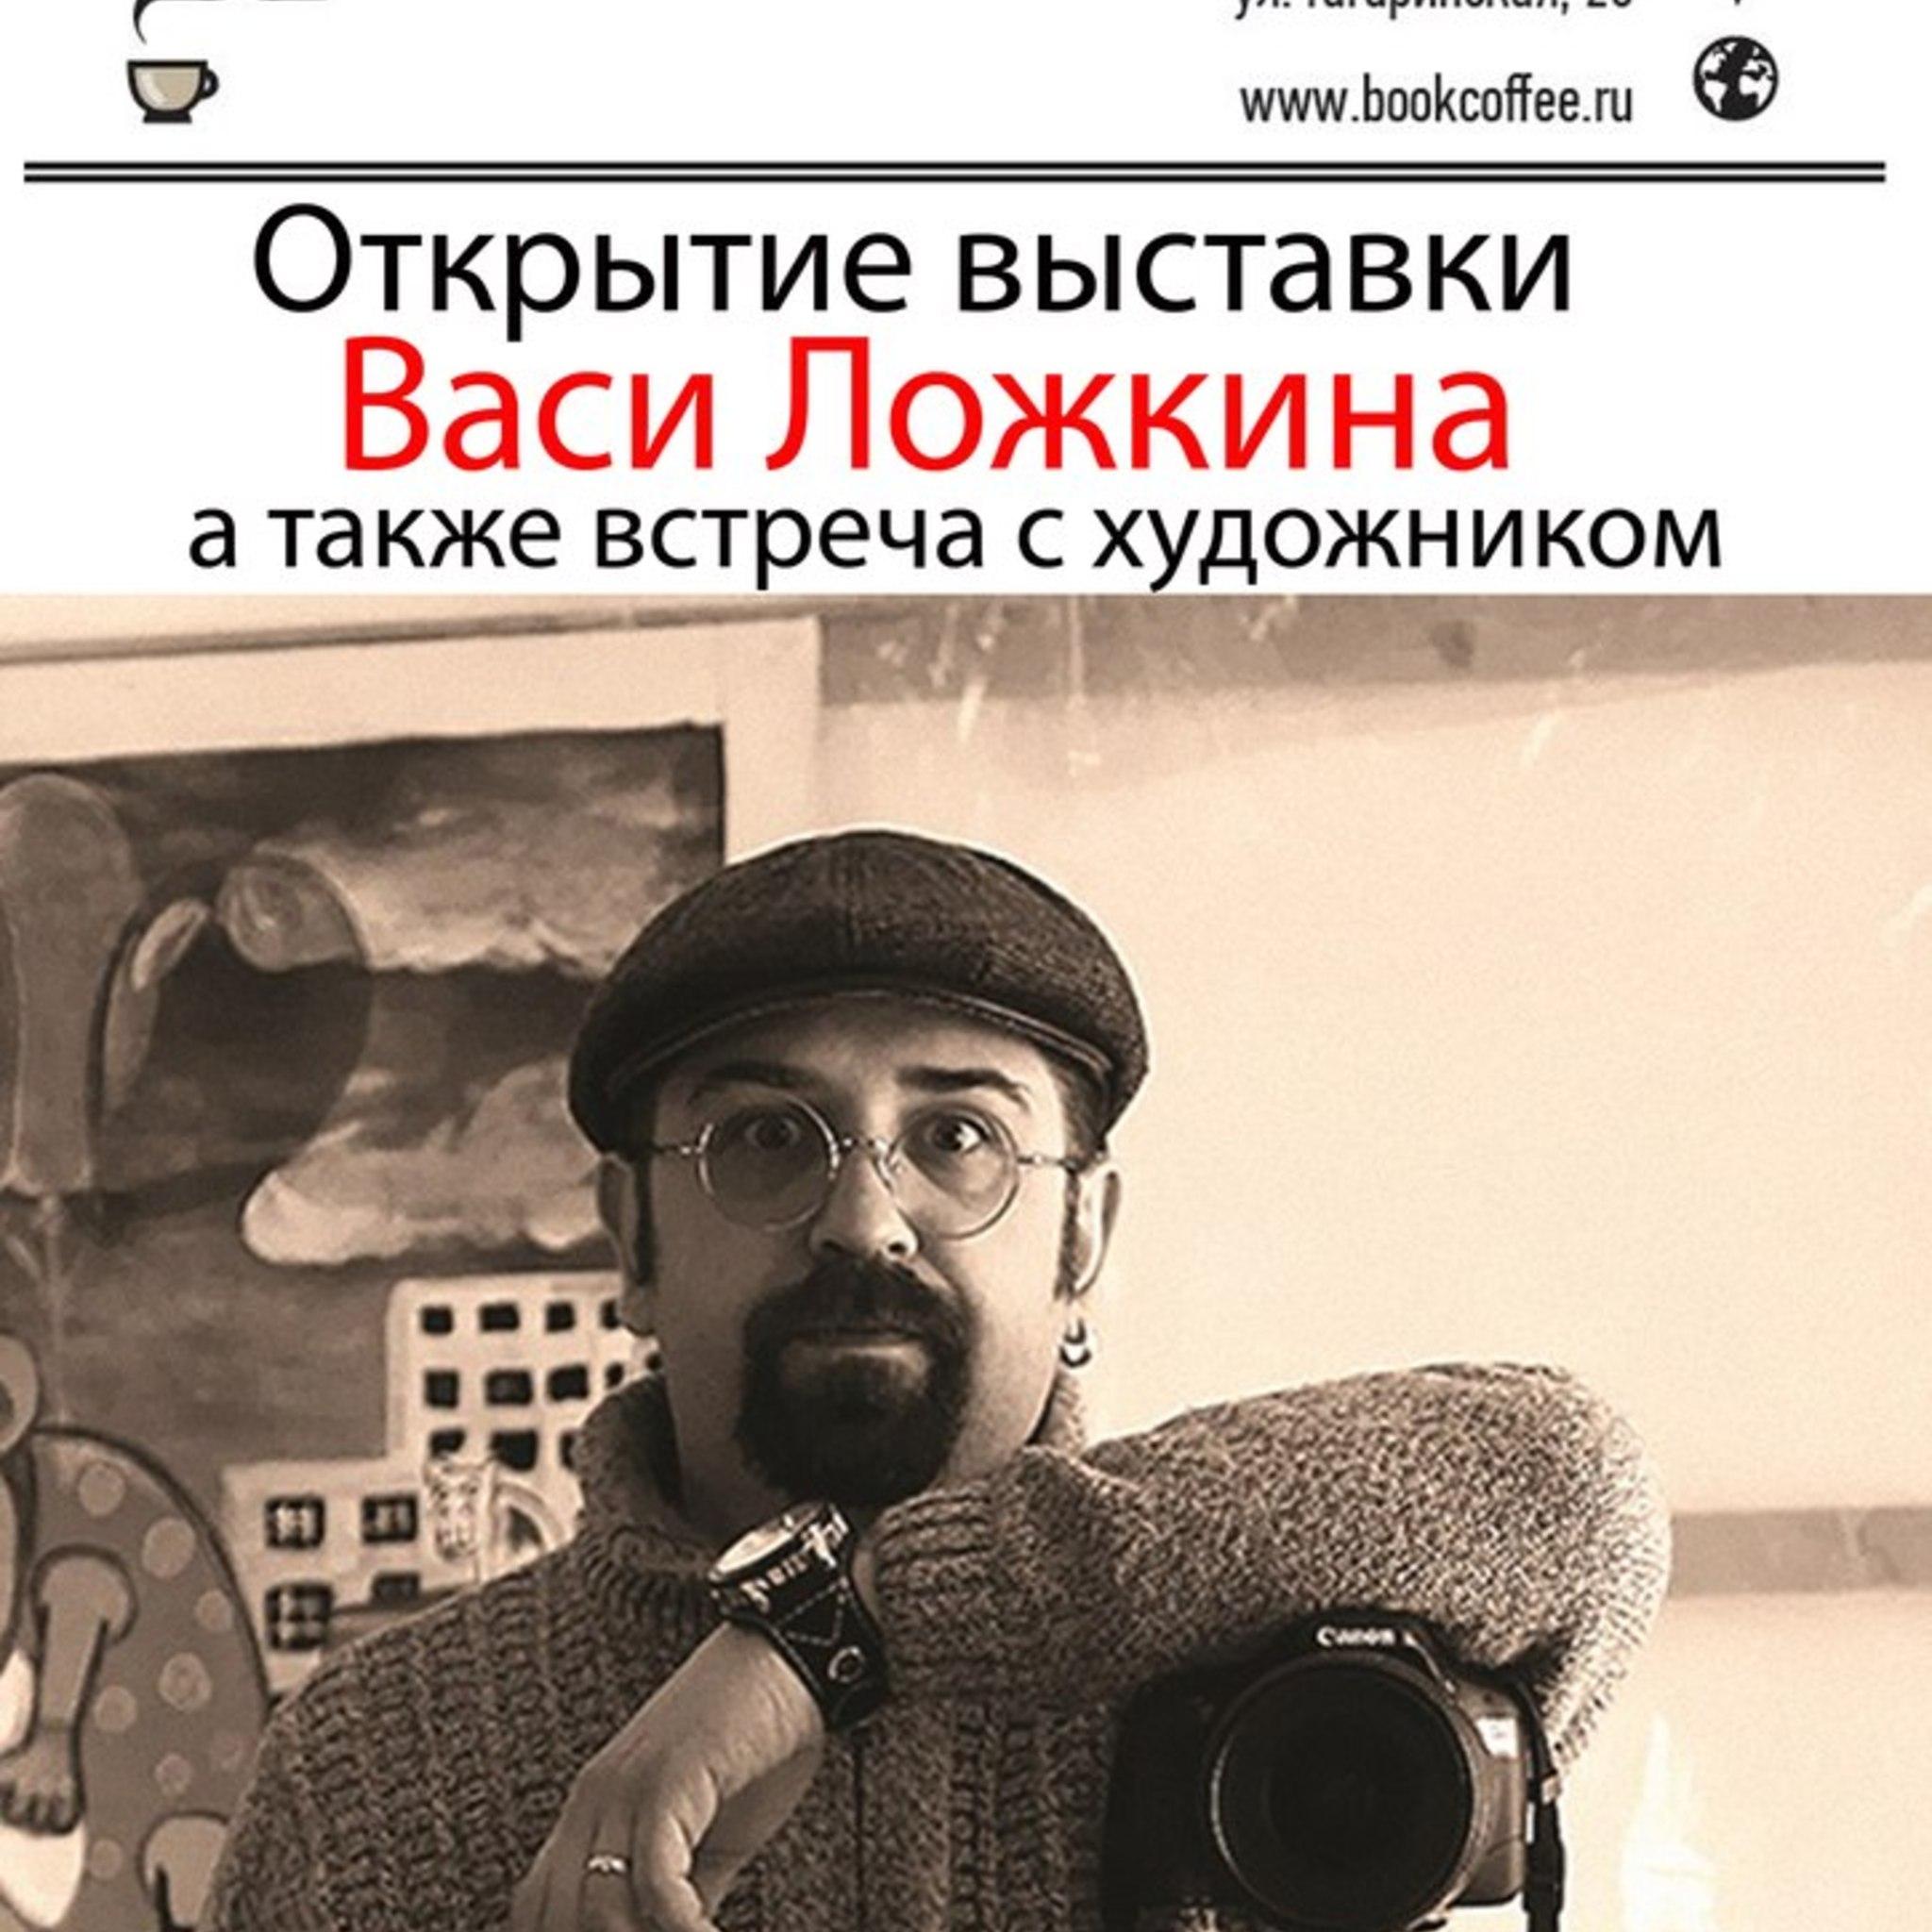 Exhibition Wasi Lozhkina